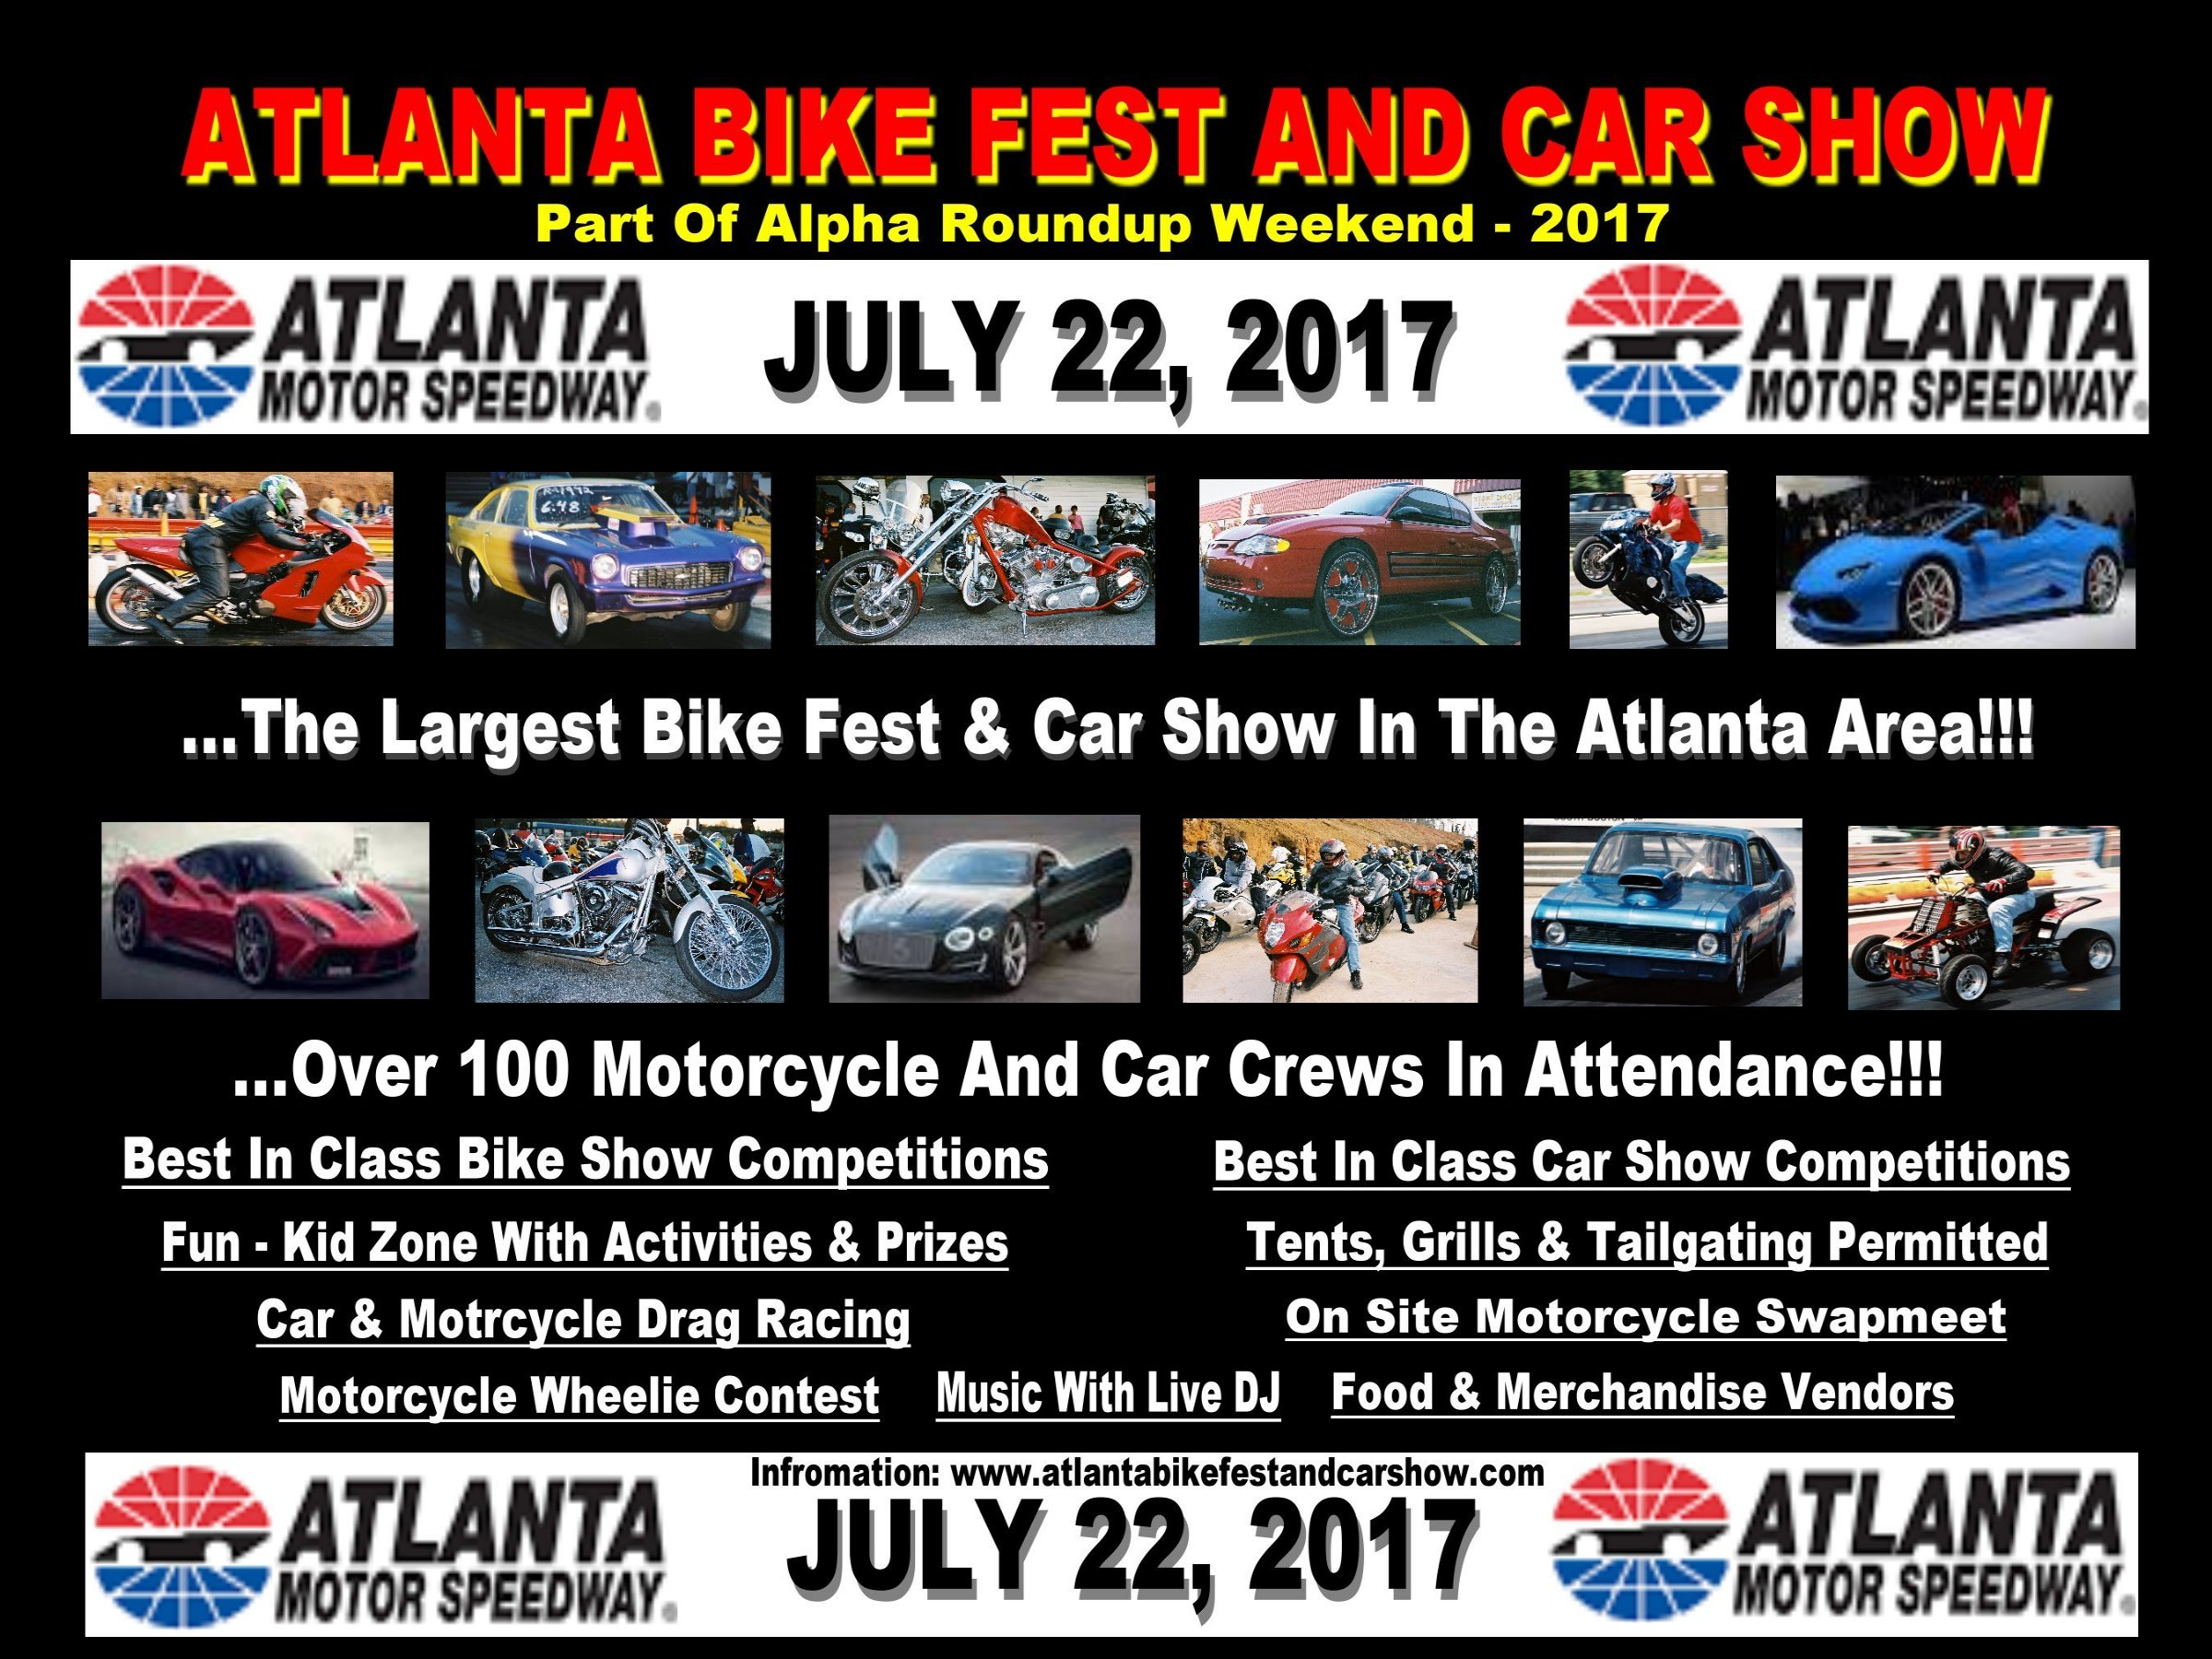 Atlanta Bike Fest And Car Show July Atlanta Motor Speedway - Car show atlanta motor speedway